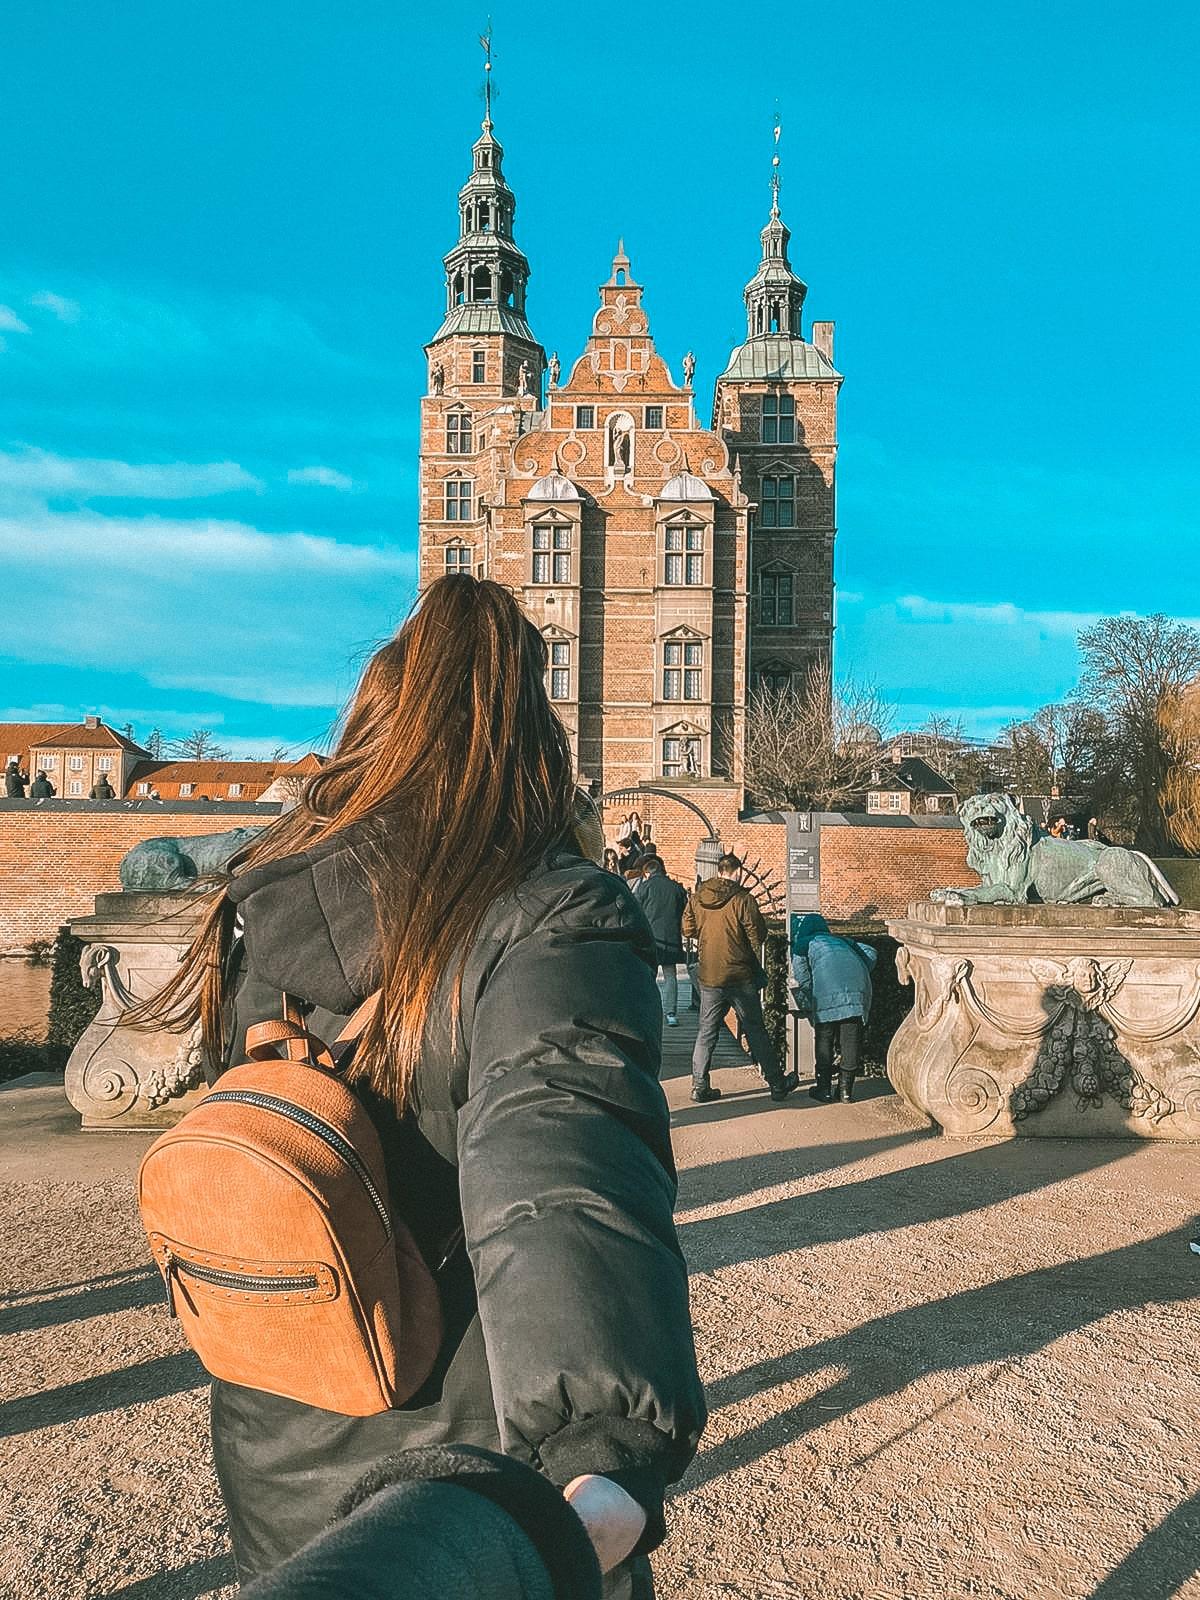 Follow me to Rosenborg Castle in Copenhagen